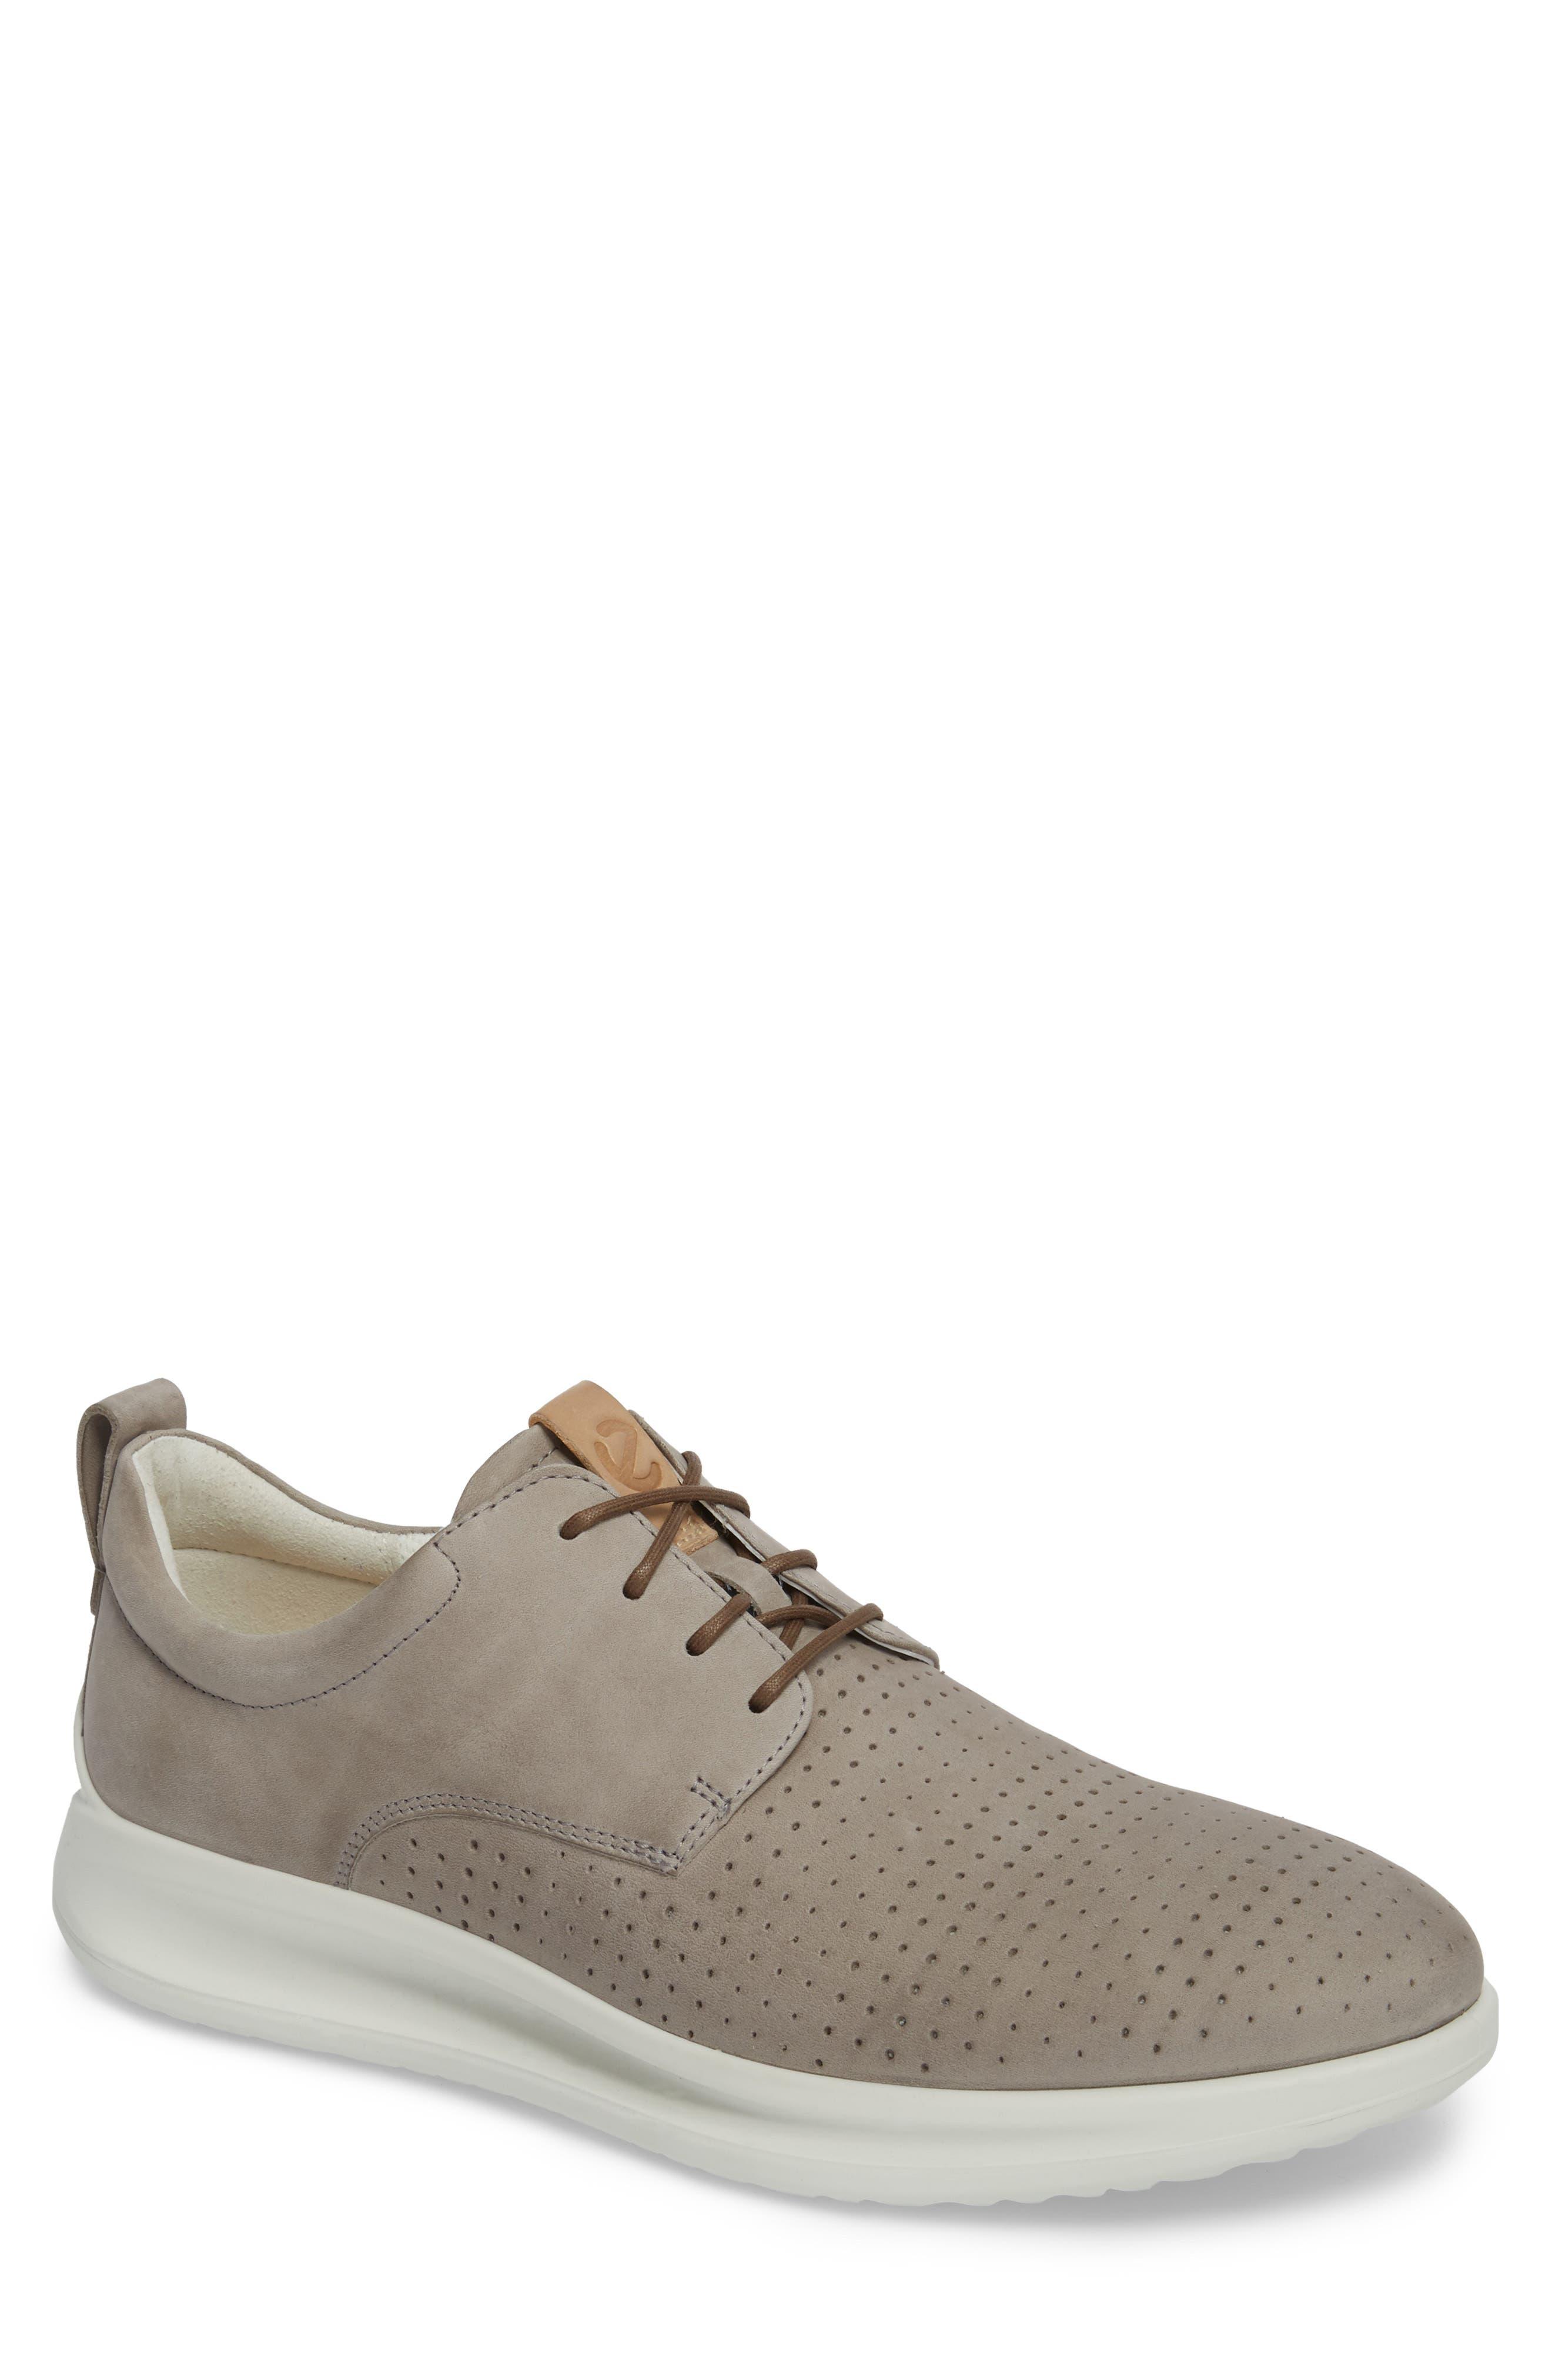 Aquet Sneaker,                         Main,                         color, Moon Rock Leather